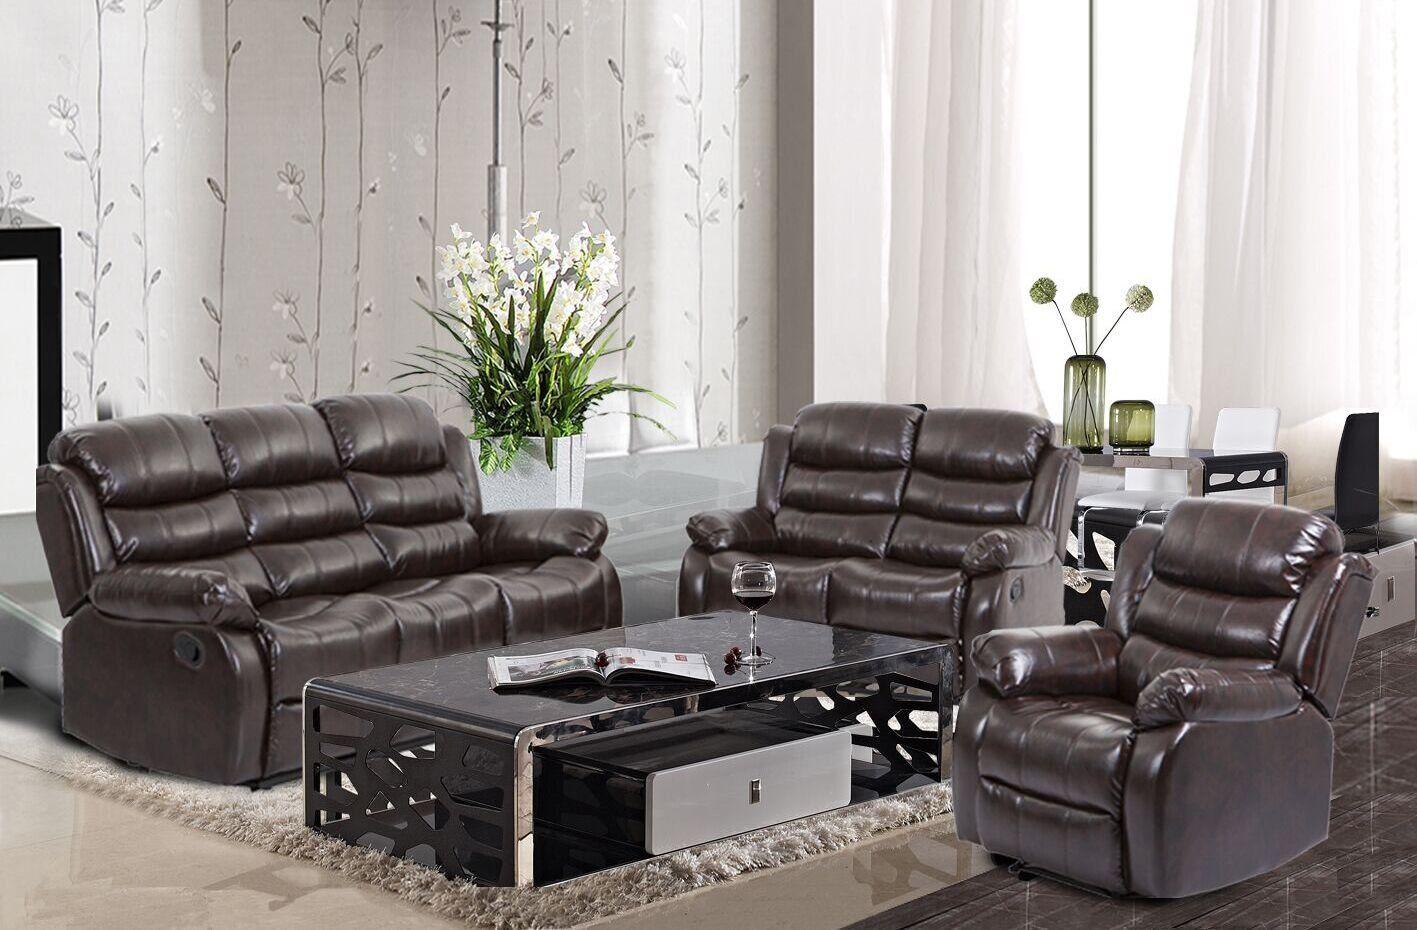 BestMassage Living Room Sofa Set Recliner Sofa Reclining ...